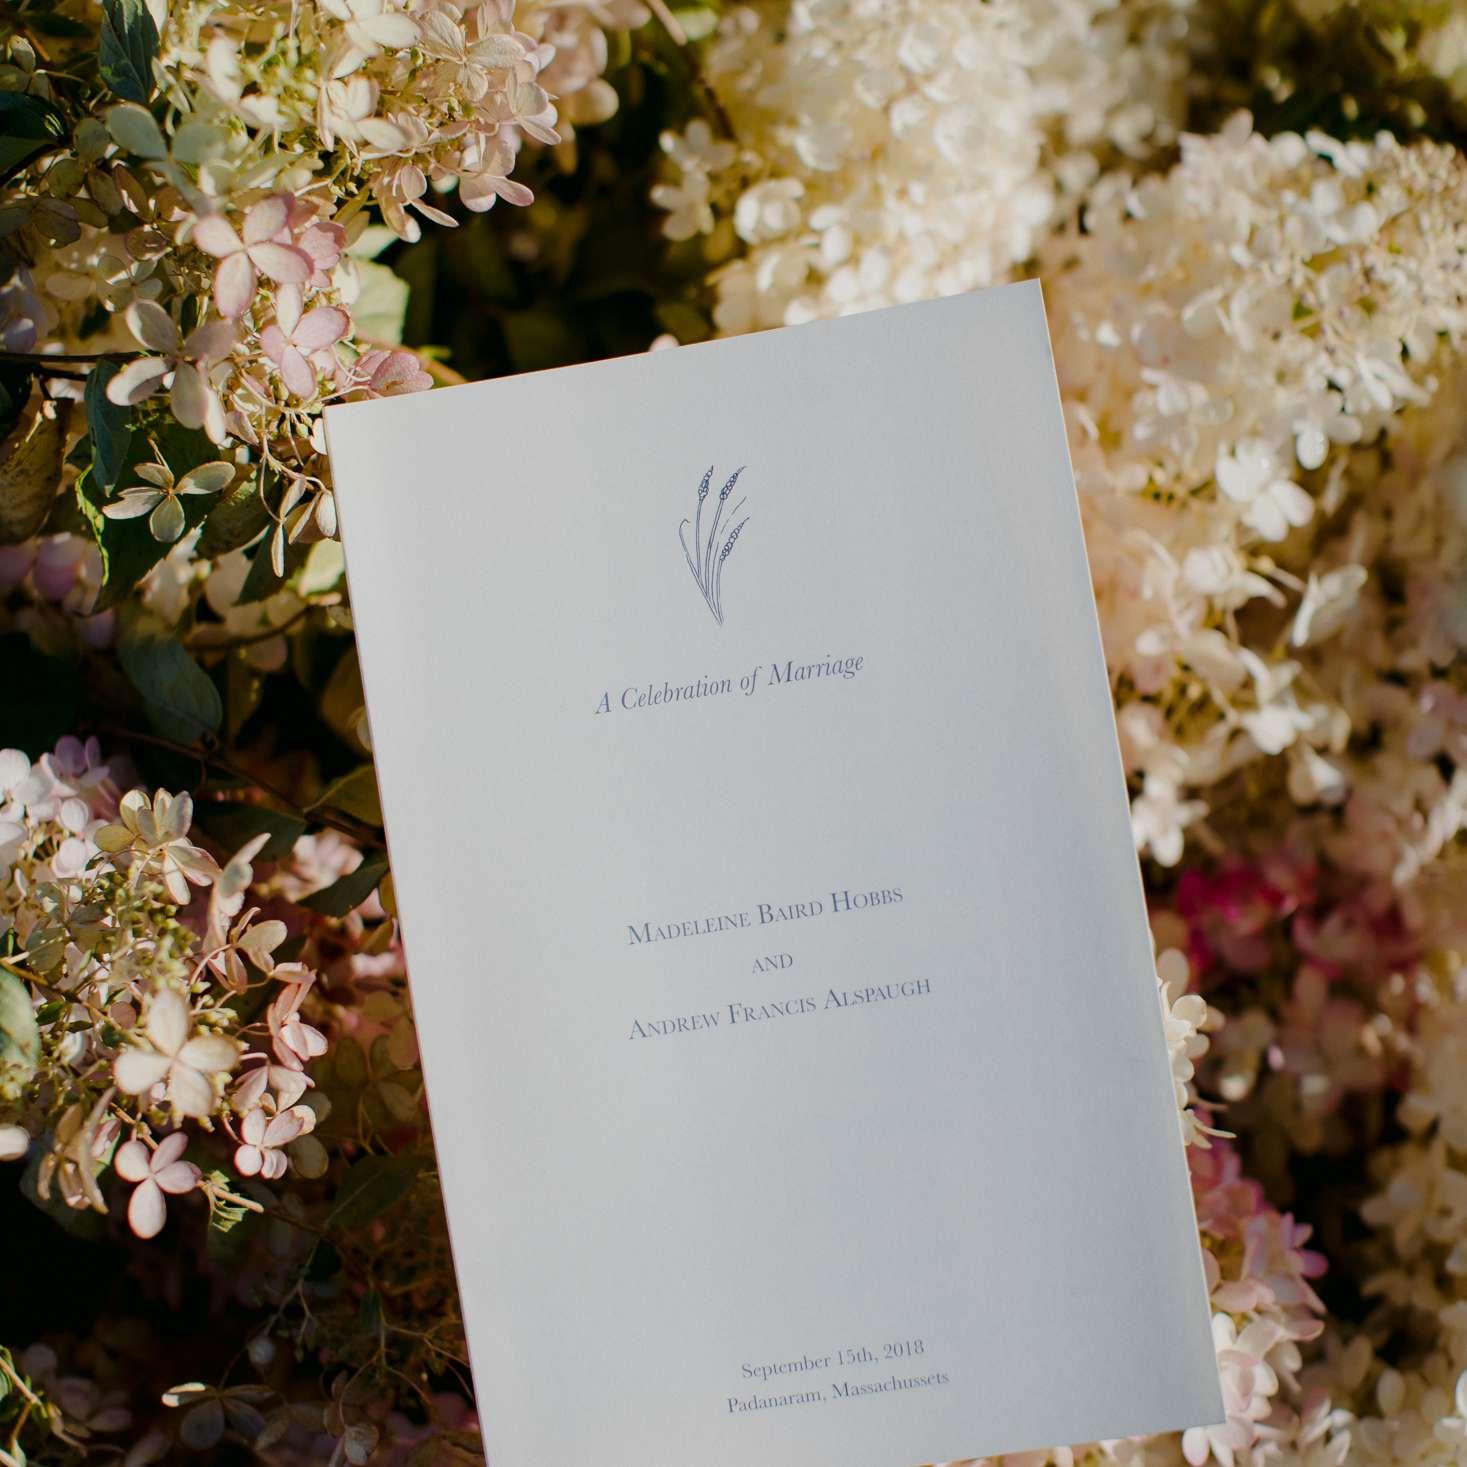 at-home rustic massachusetts wedding, ceremony program against flowers